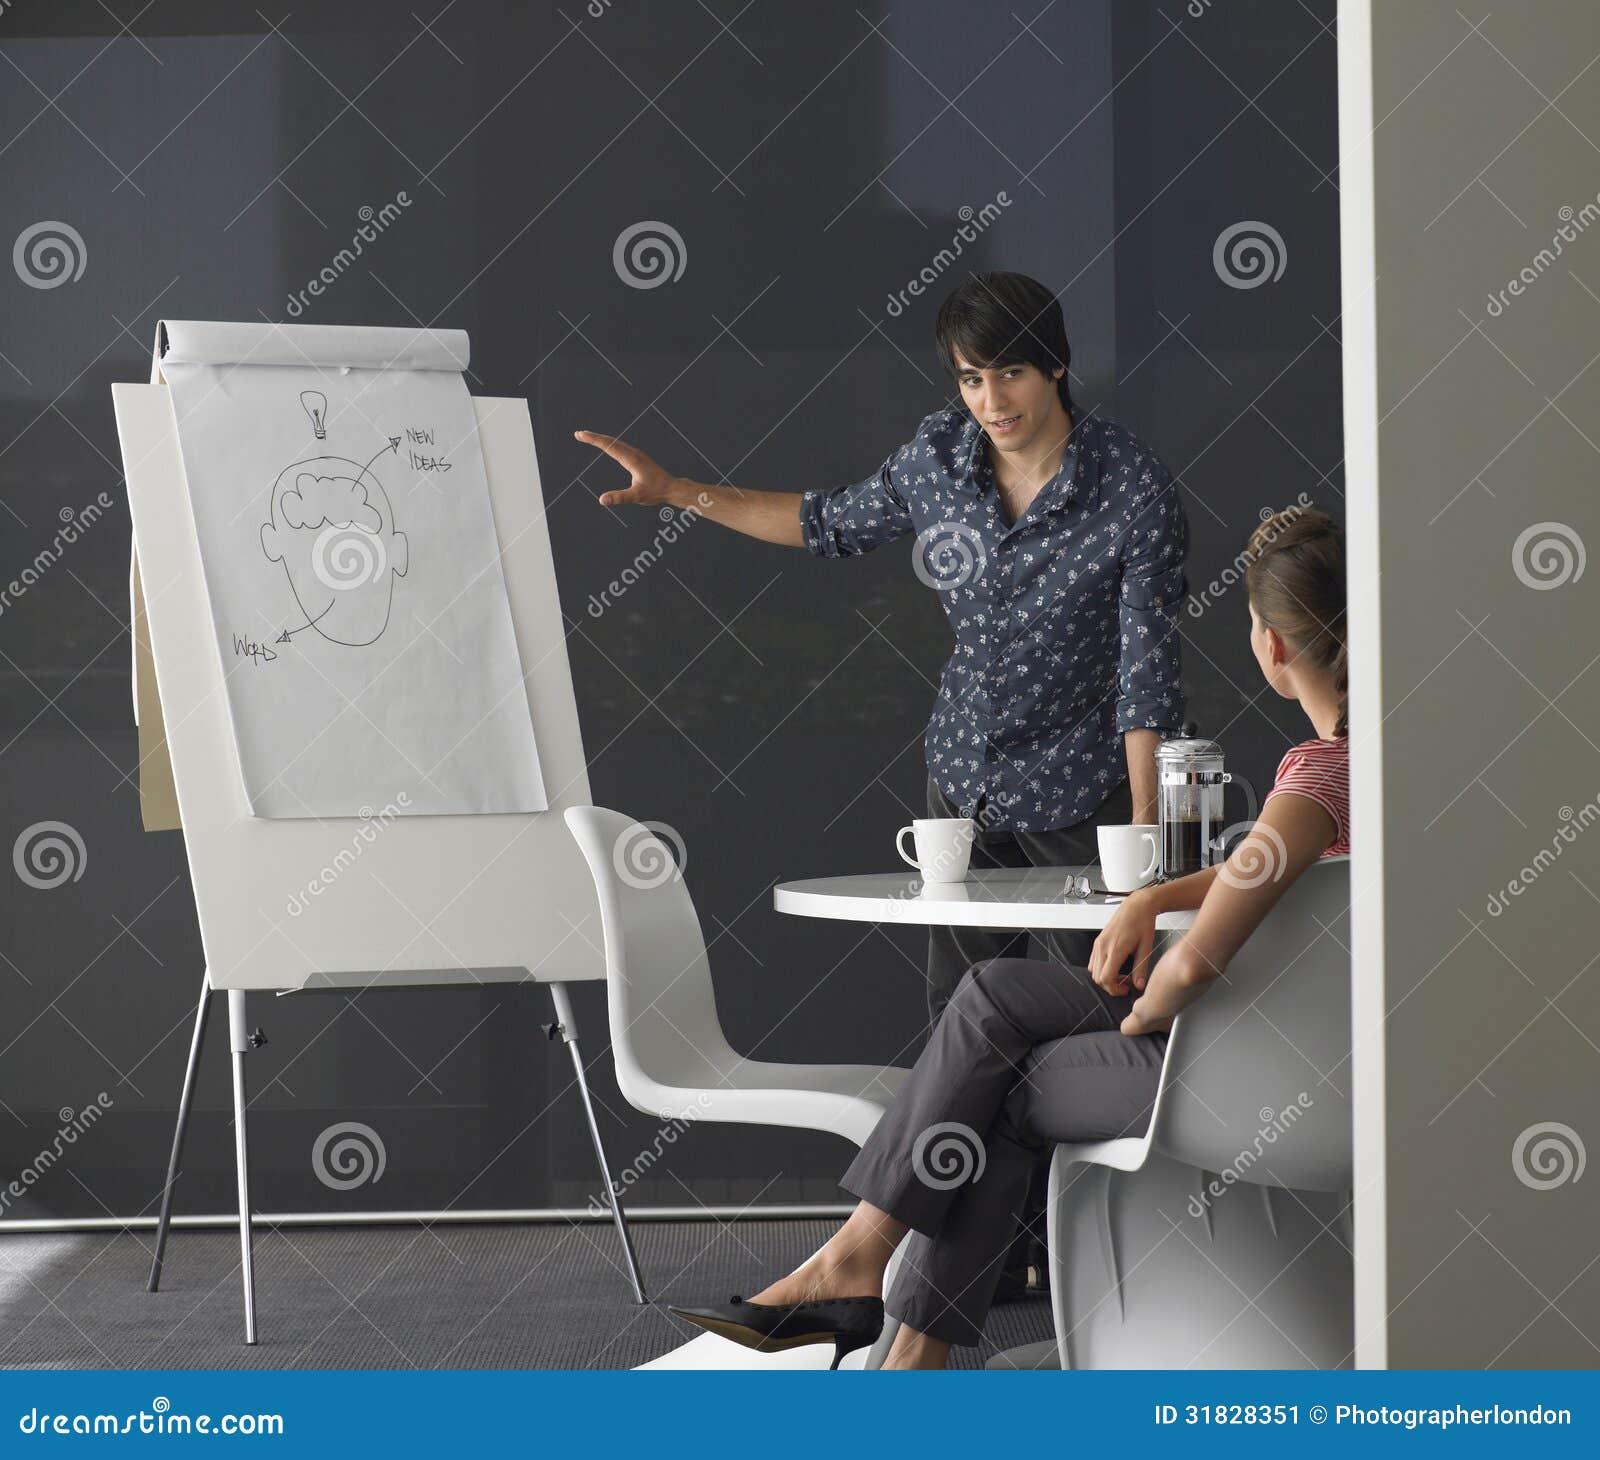 Businessman Giving Presentation On Flipchart